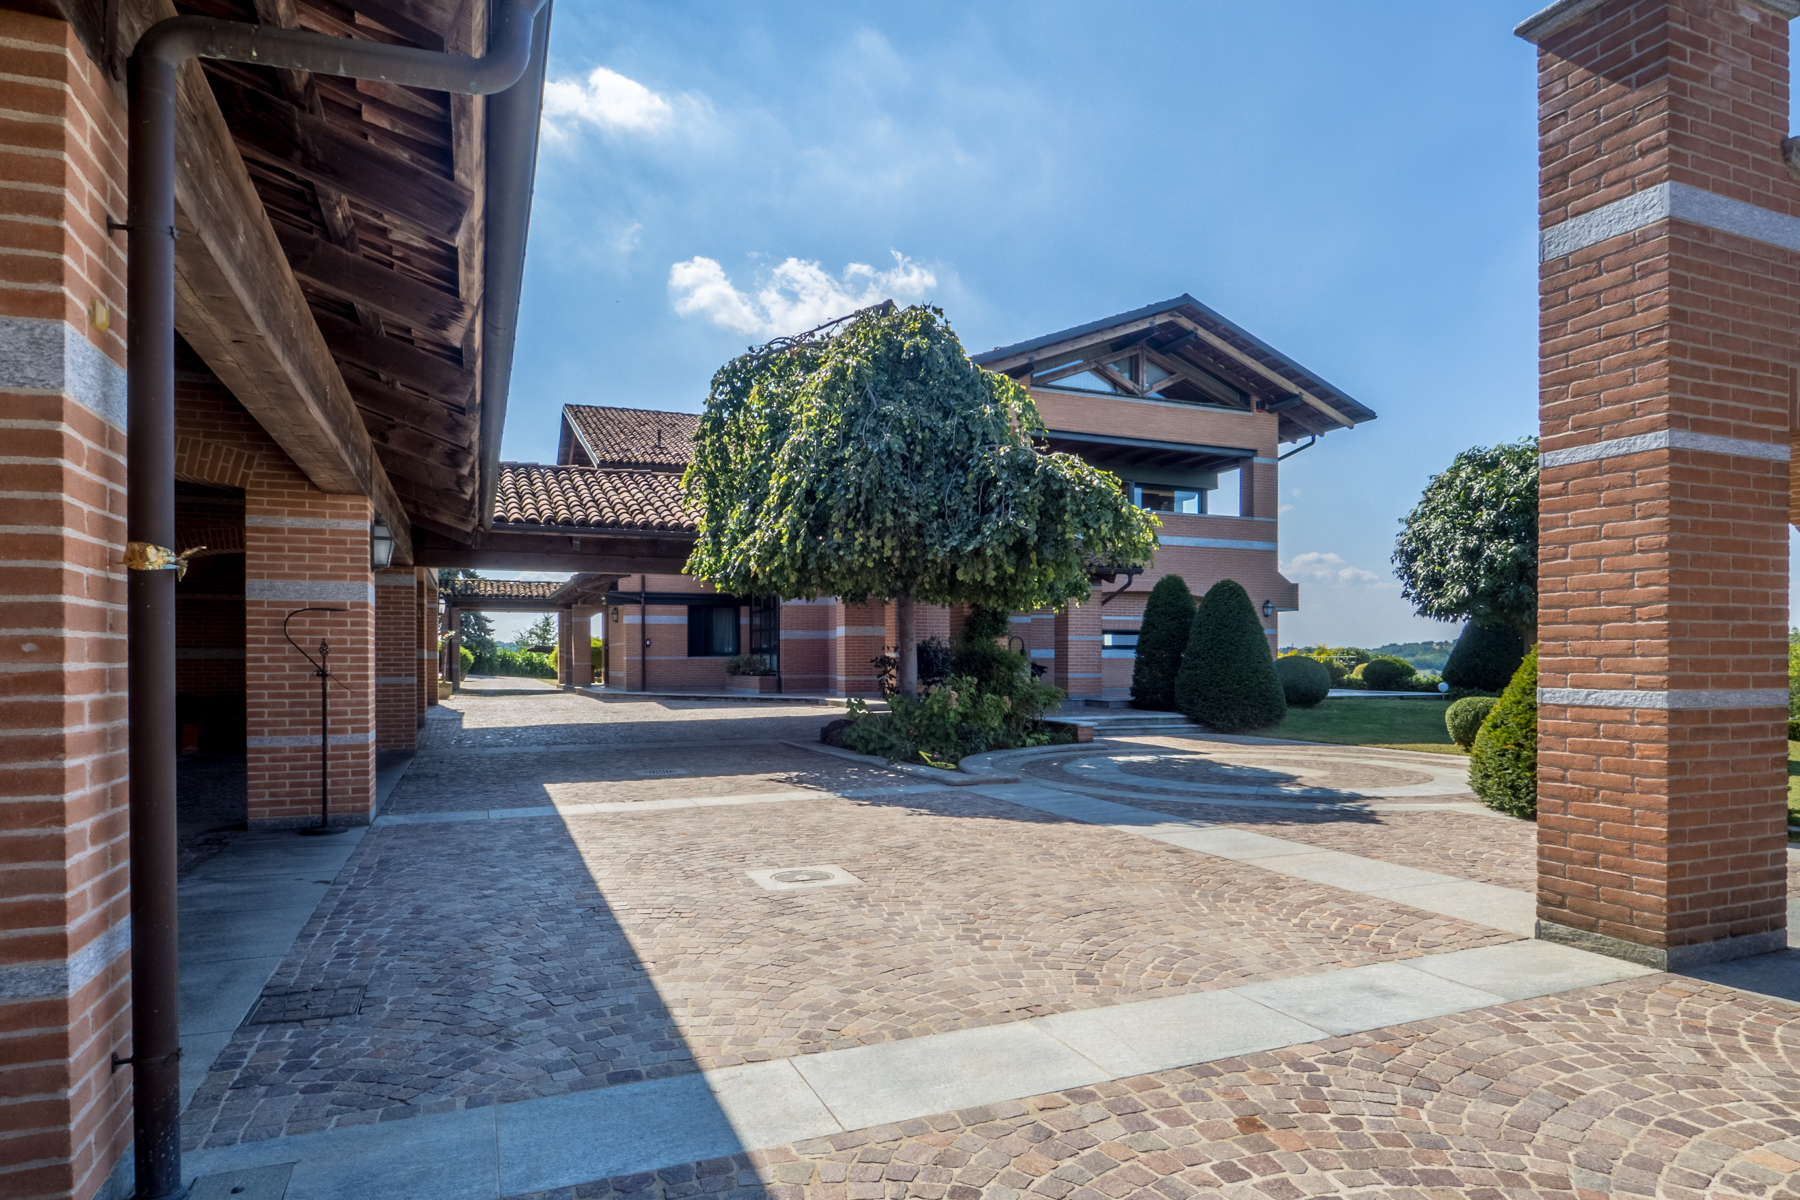 Villa in Vendita a Cantarana: 5 locali, 700 mq - Foto 4